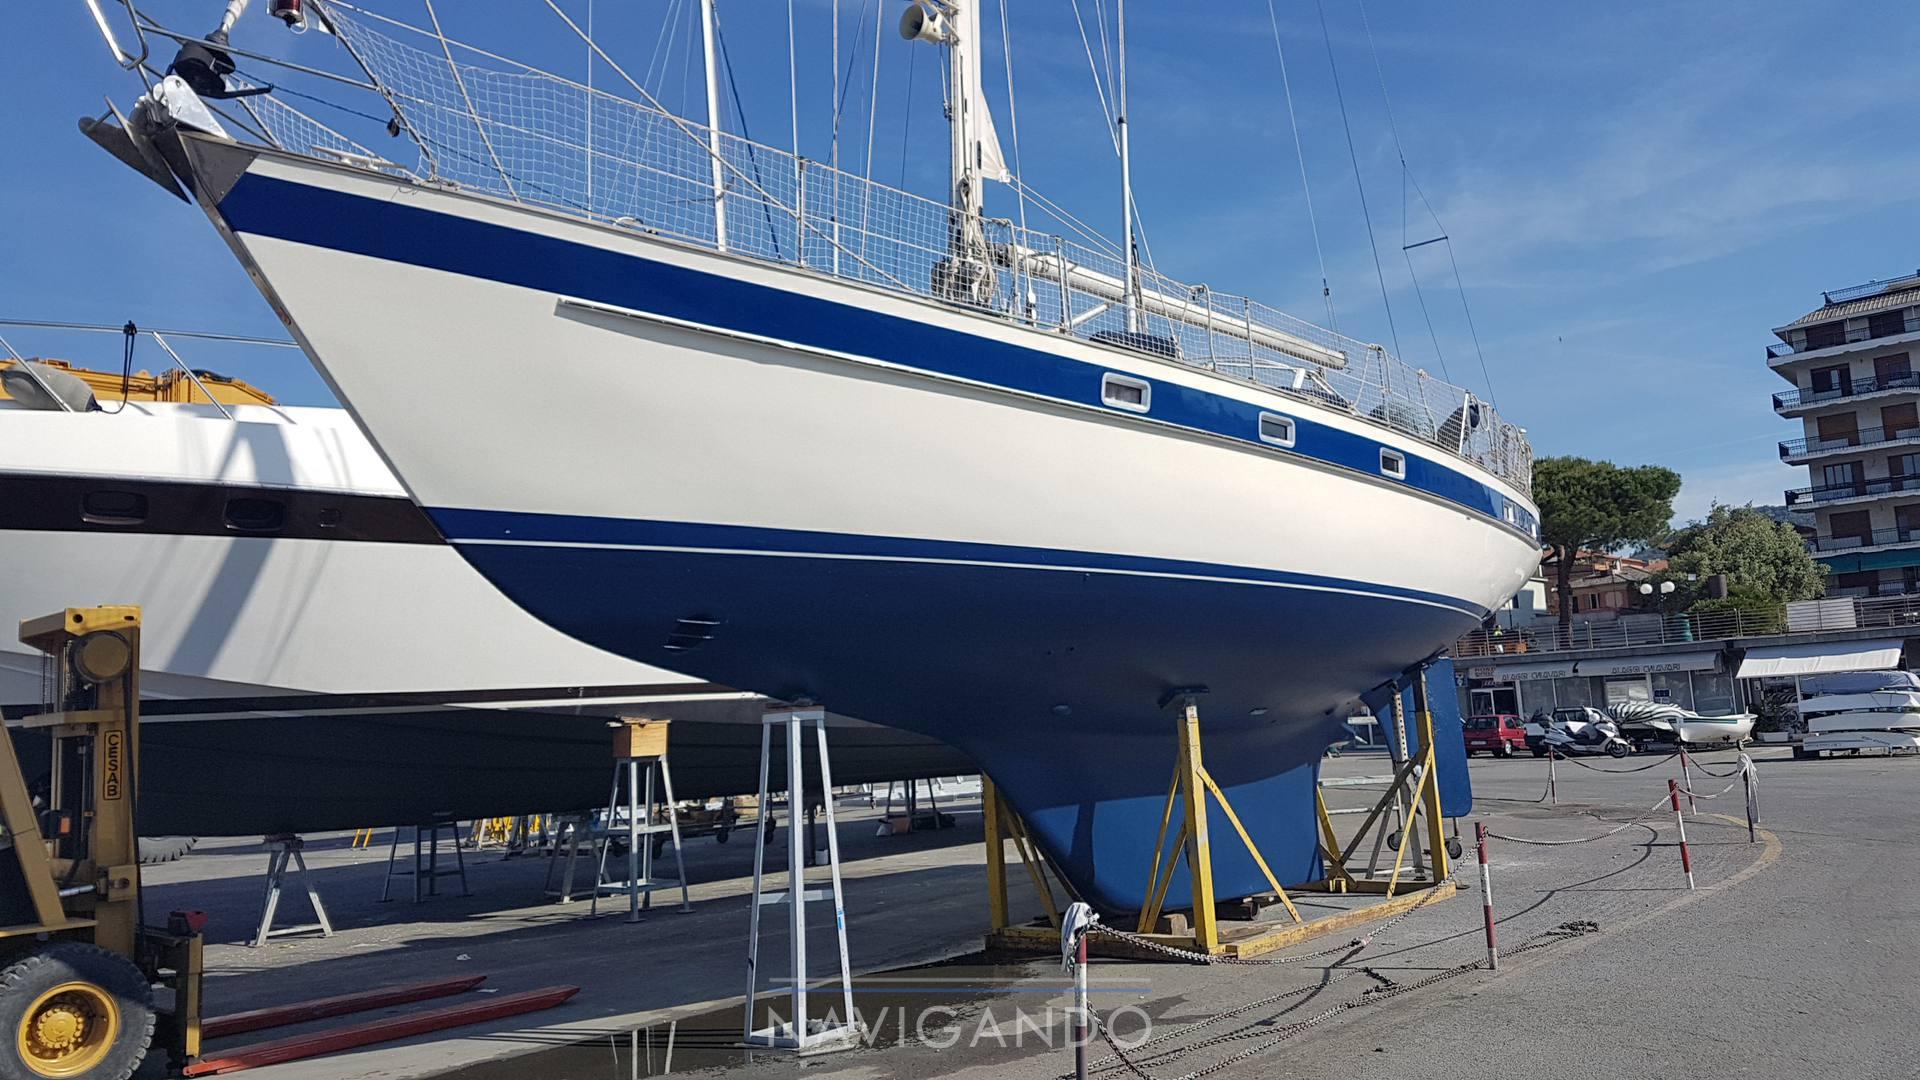 Hallberg Rassy 42 sailing boat